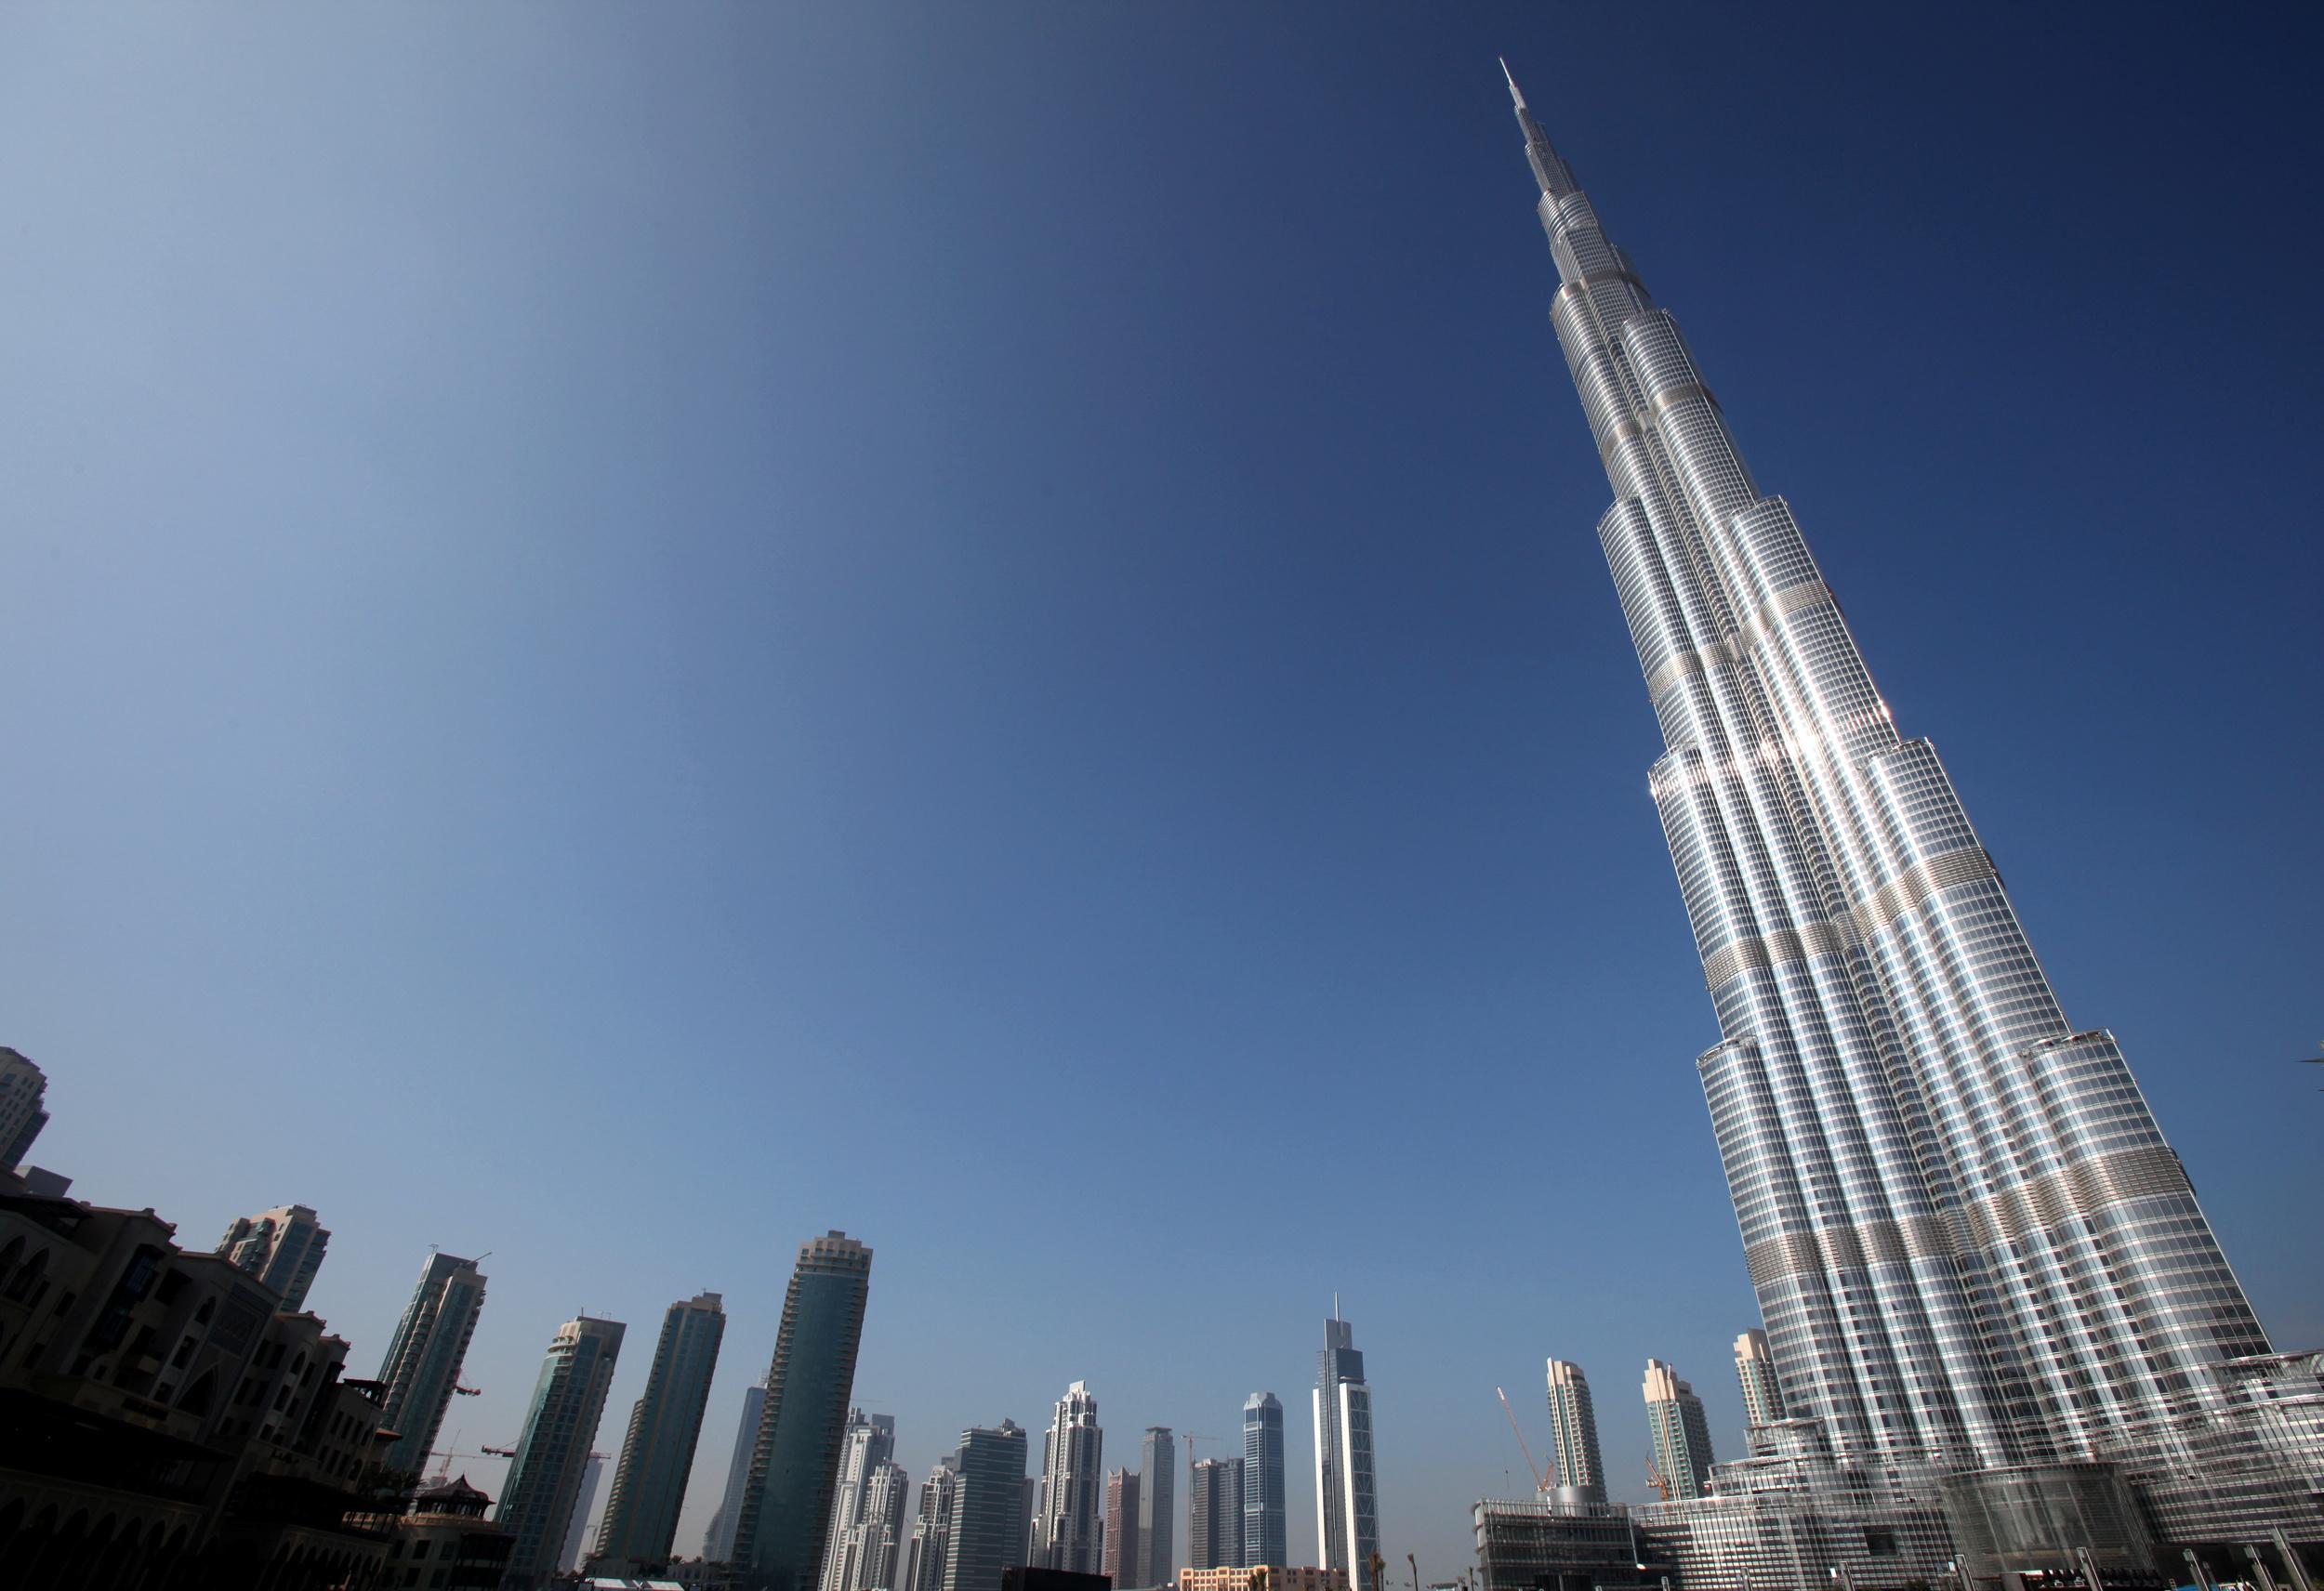 The skyline of Dubai shows the Burj Dubai Tower, the tallest tower in the world January 4, 2010. REUTERS/Ahmed Jadallah/File Photo